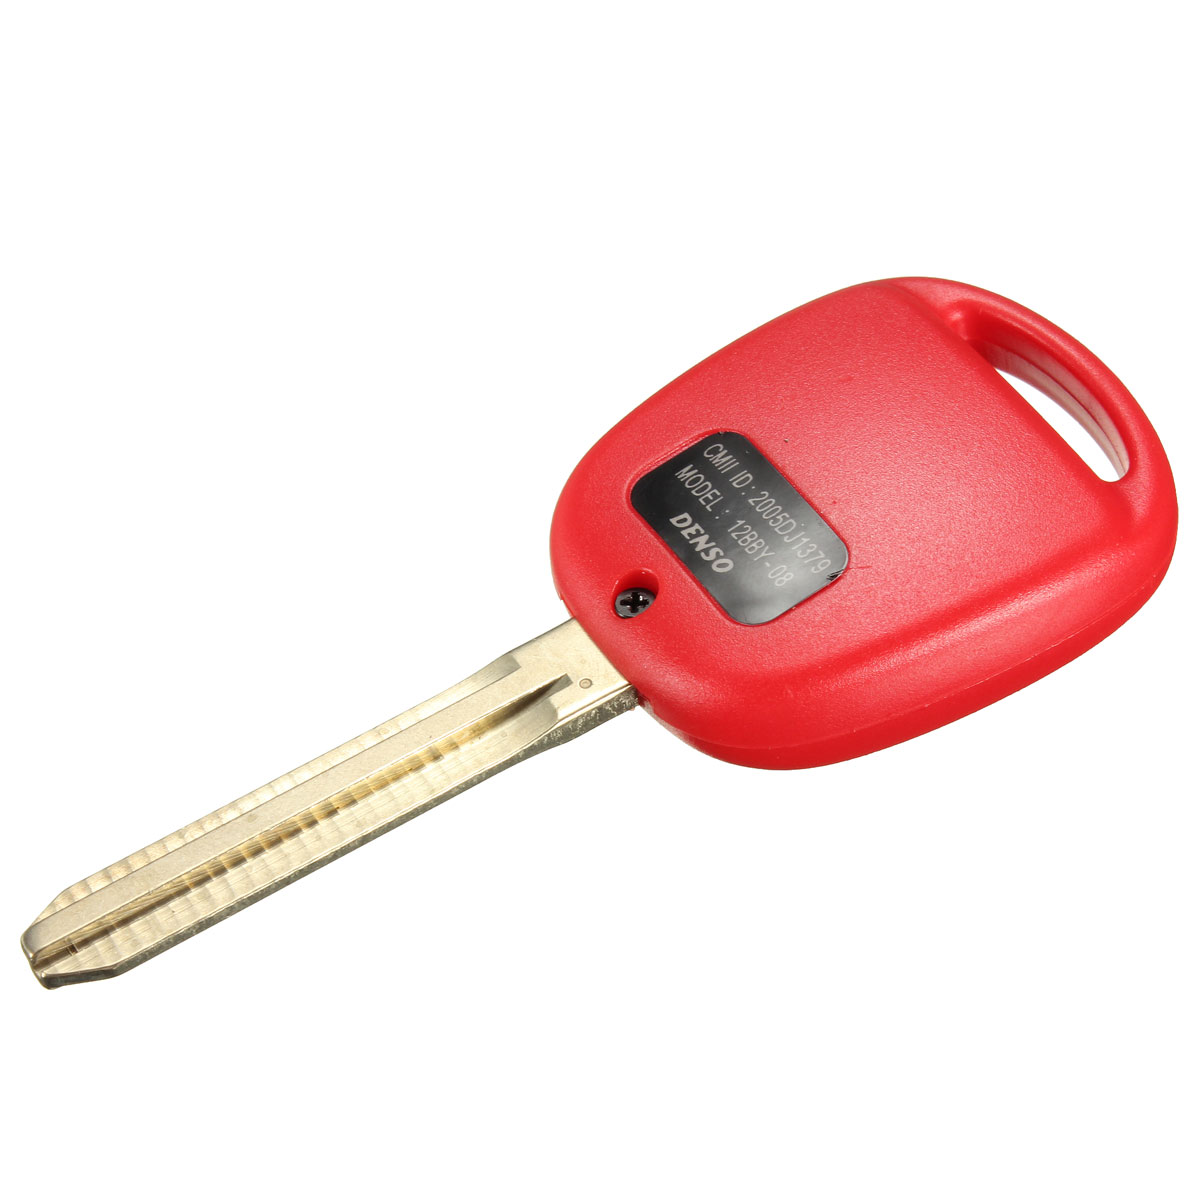 2 button remote key fob case for toyota camry rav4 corolla celica prado avens. Black Bedroom Furniture Sets. Home Design Ideas